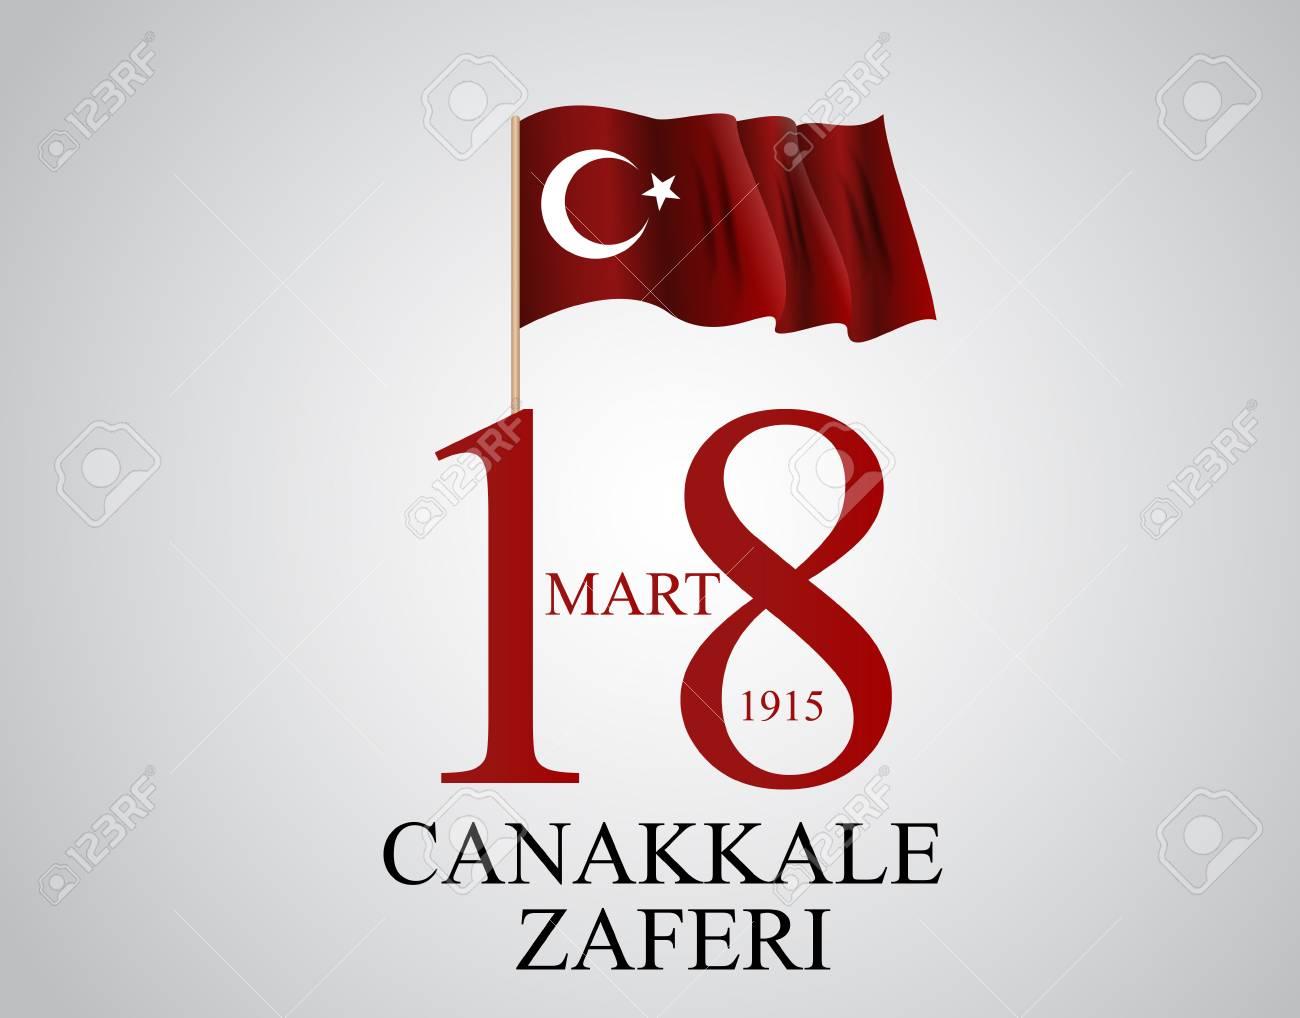 18 mart canakkale zaferi. Translation: 18 March, Canakkale Victory Day. Vector Illustration EPS10 - 125861967